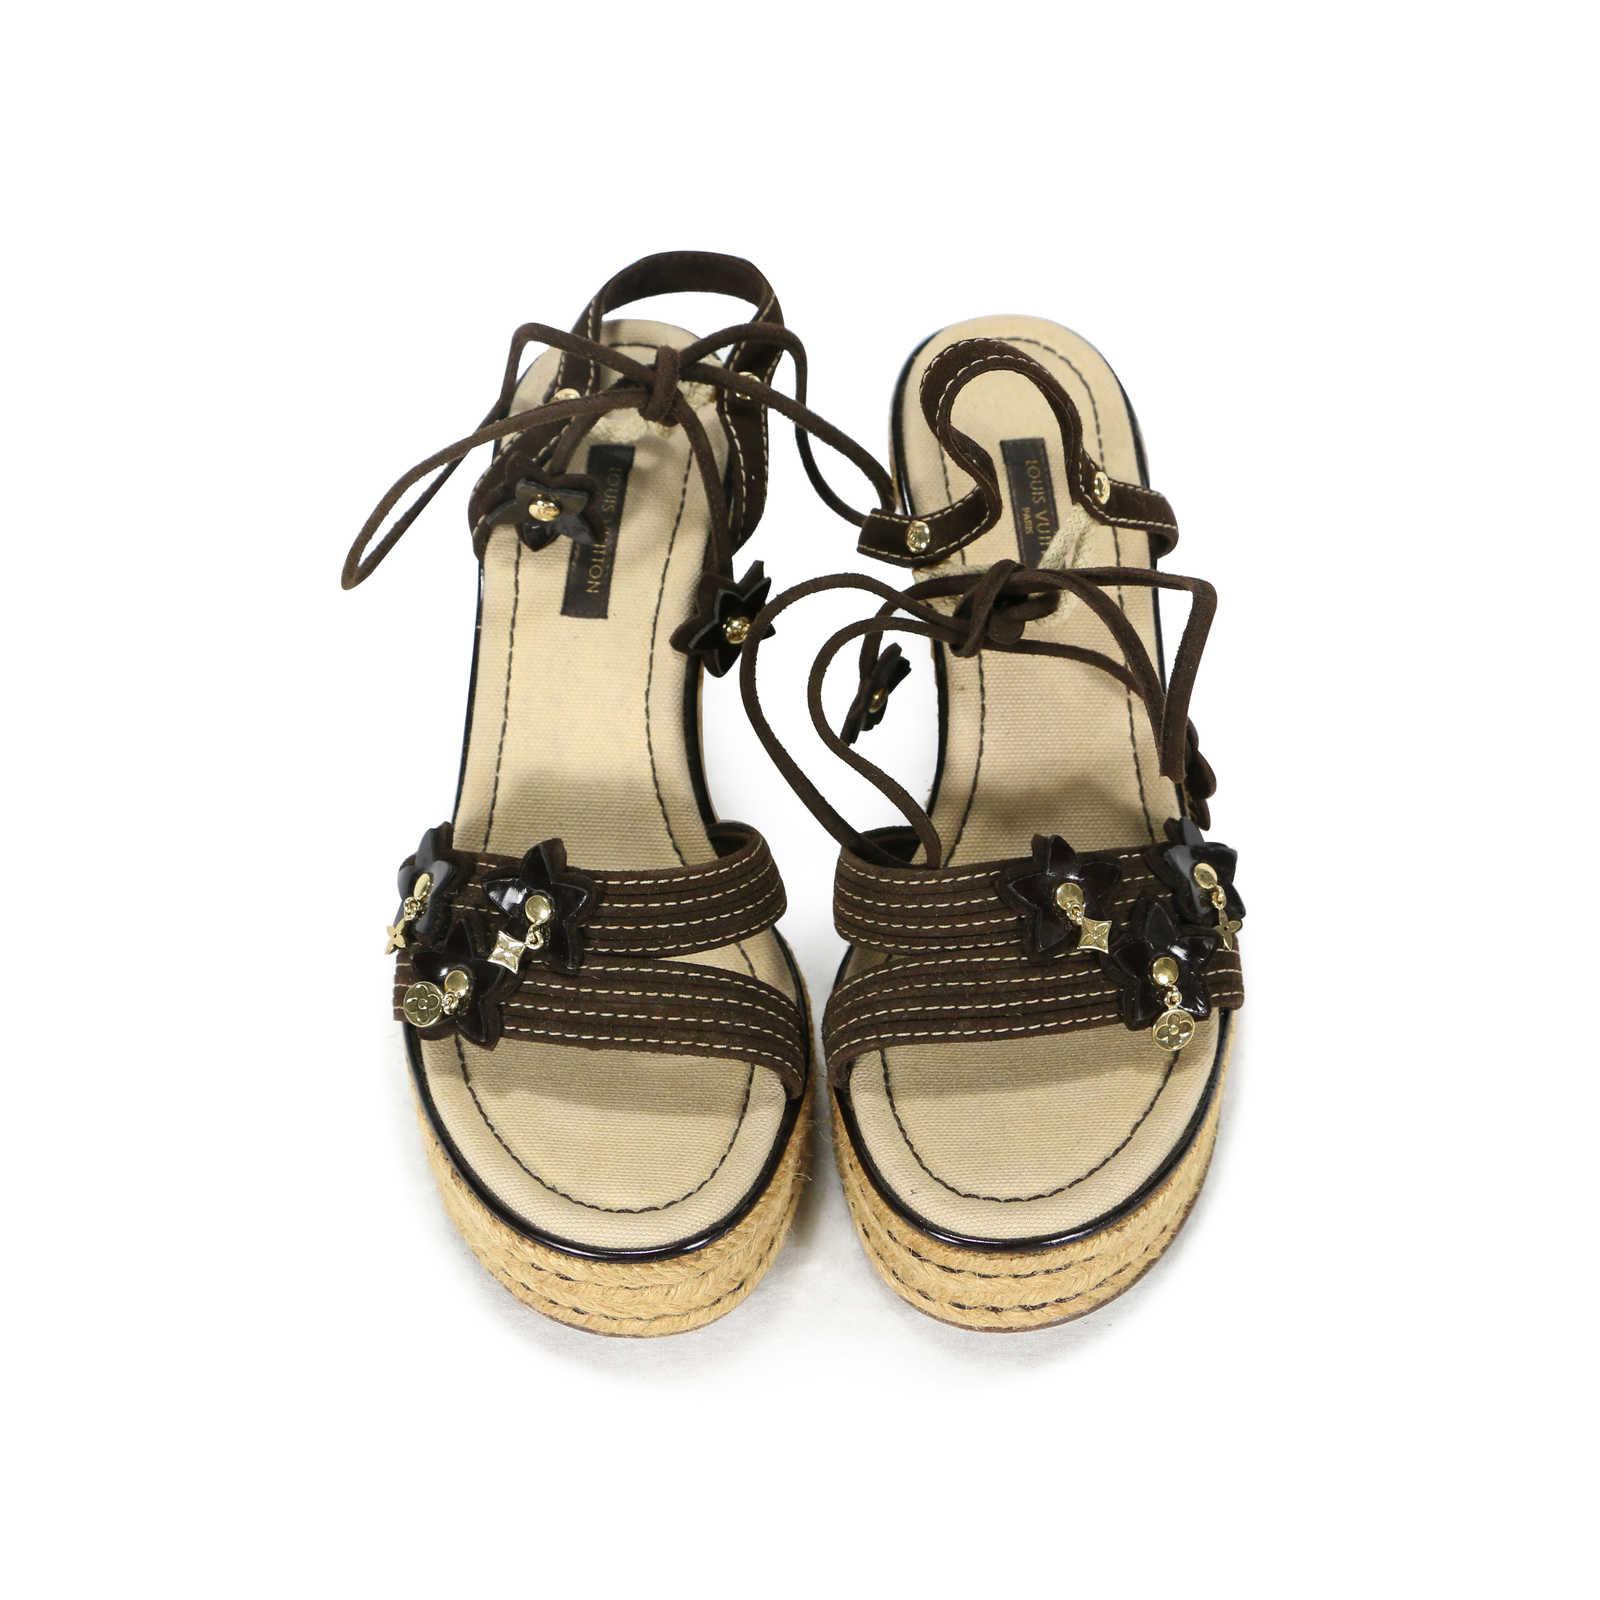 044112ef5c Authentic Second Hand Louis Vuitton Espadrille Wedge Lace Up Sandals  (PSS-200-00216 .